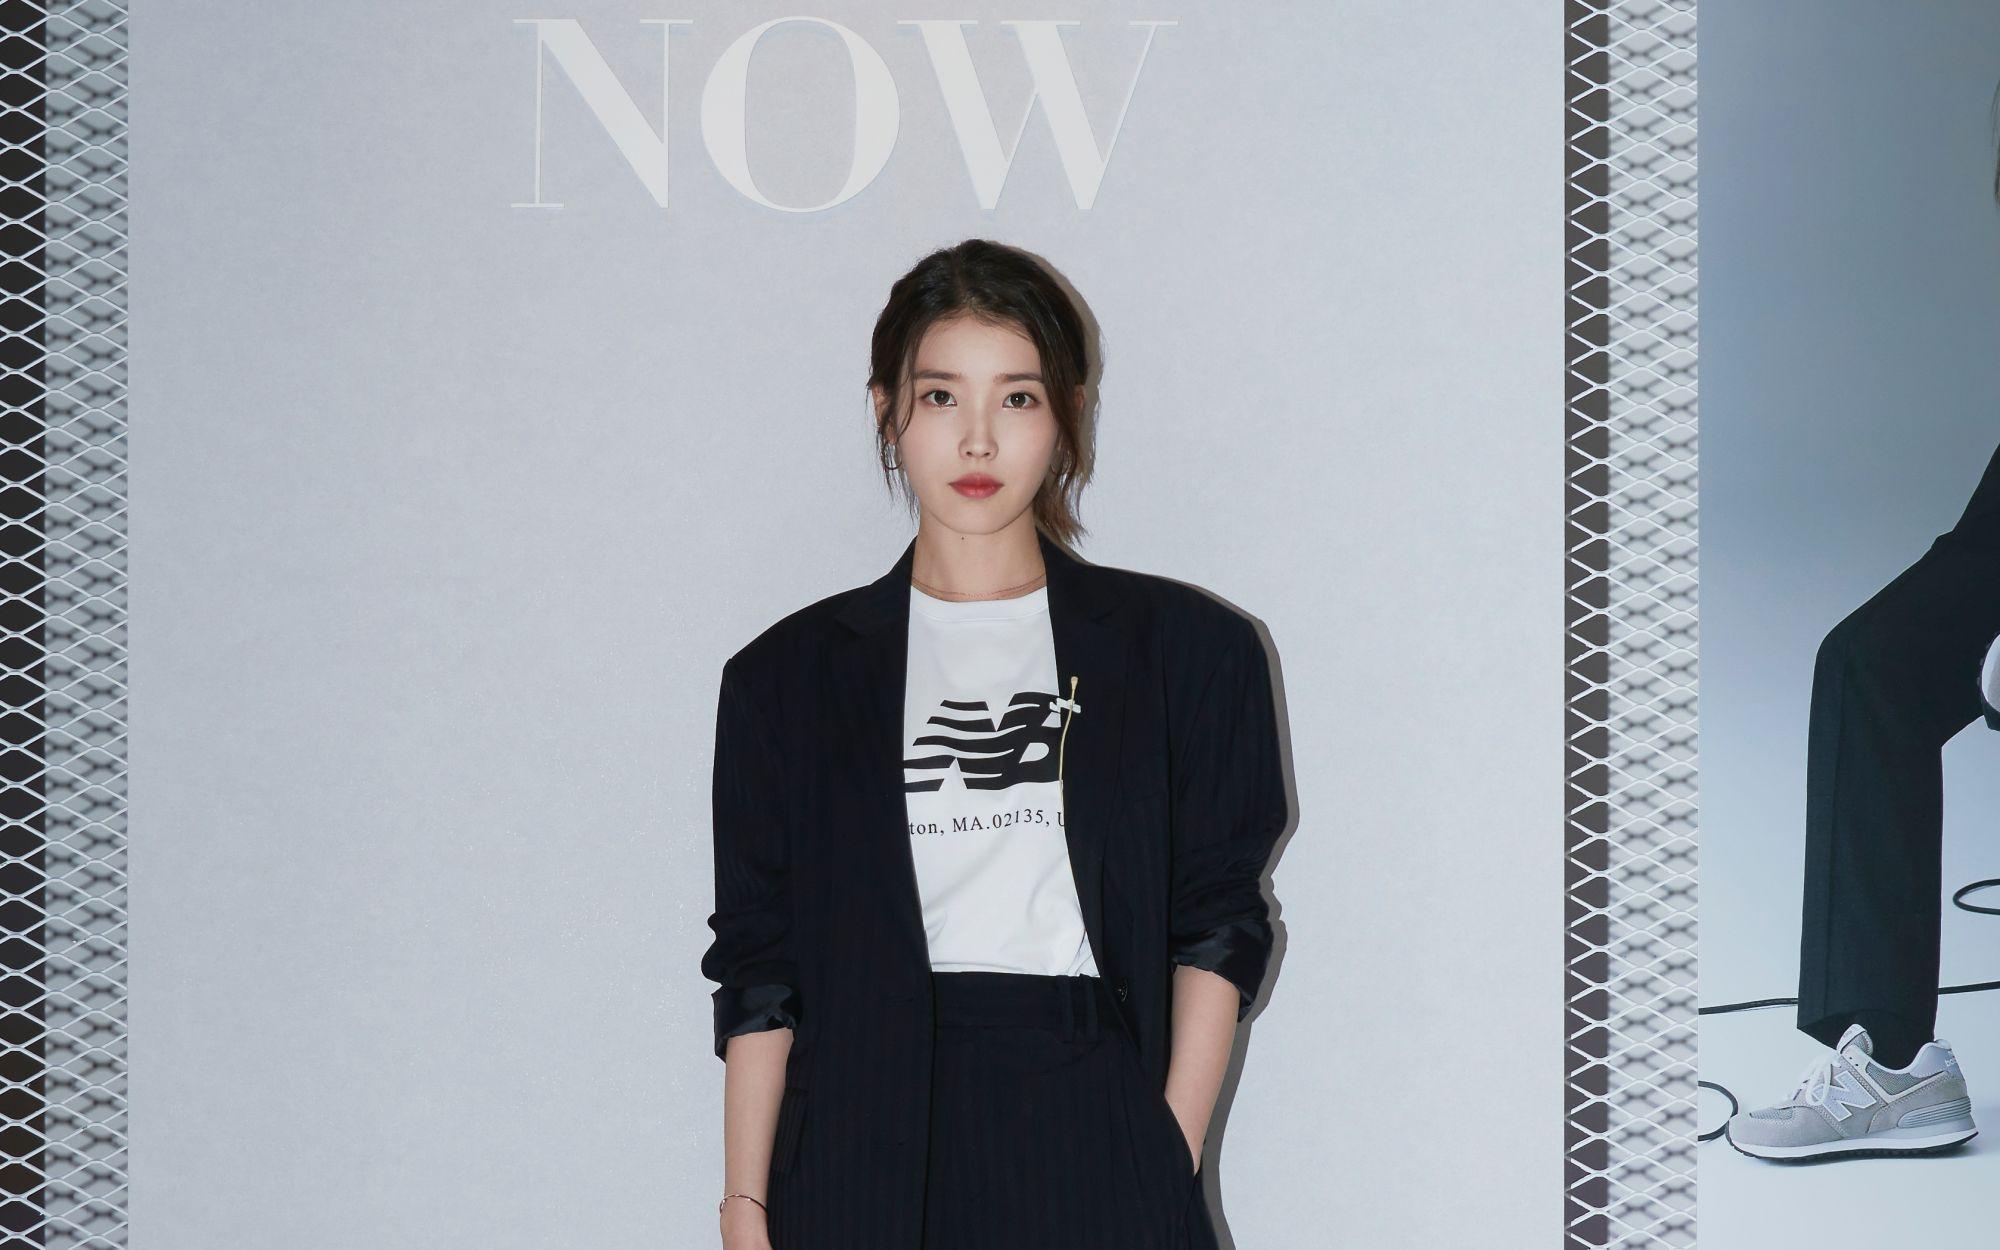 K-Pop Singer IU is New Balance's Latest Brand Ambassador